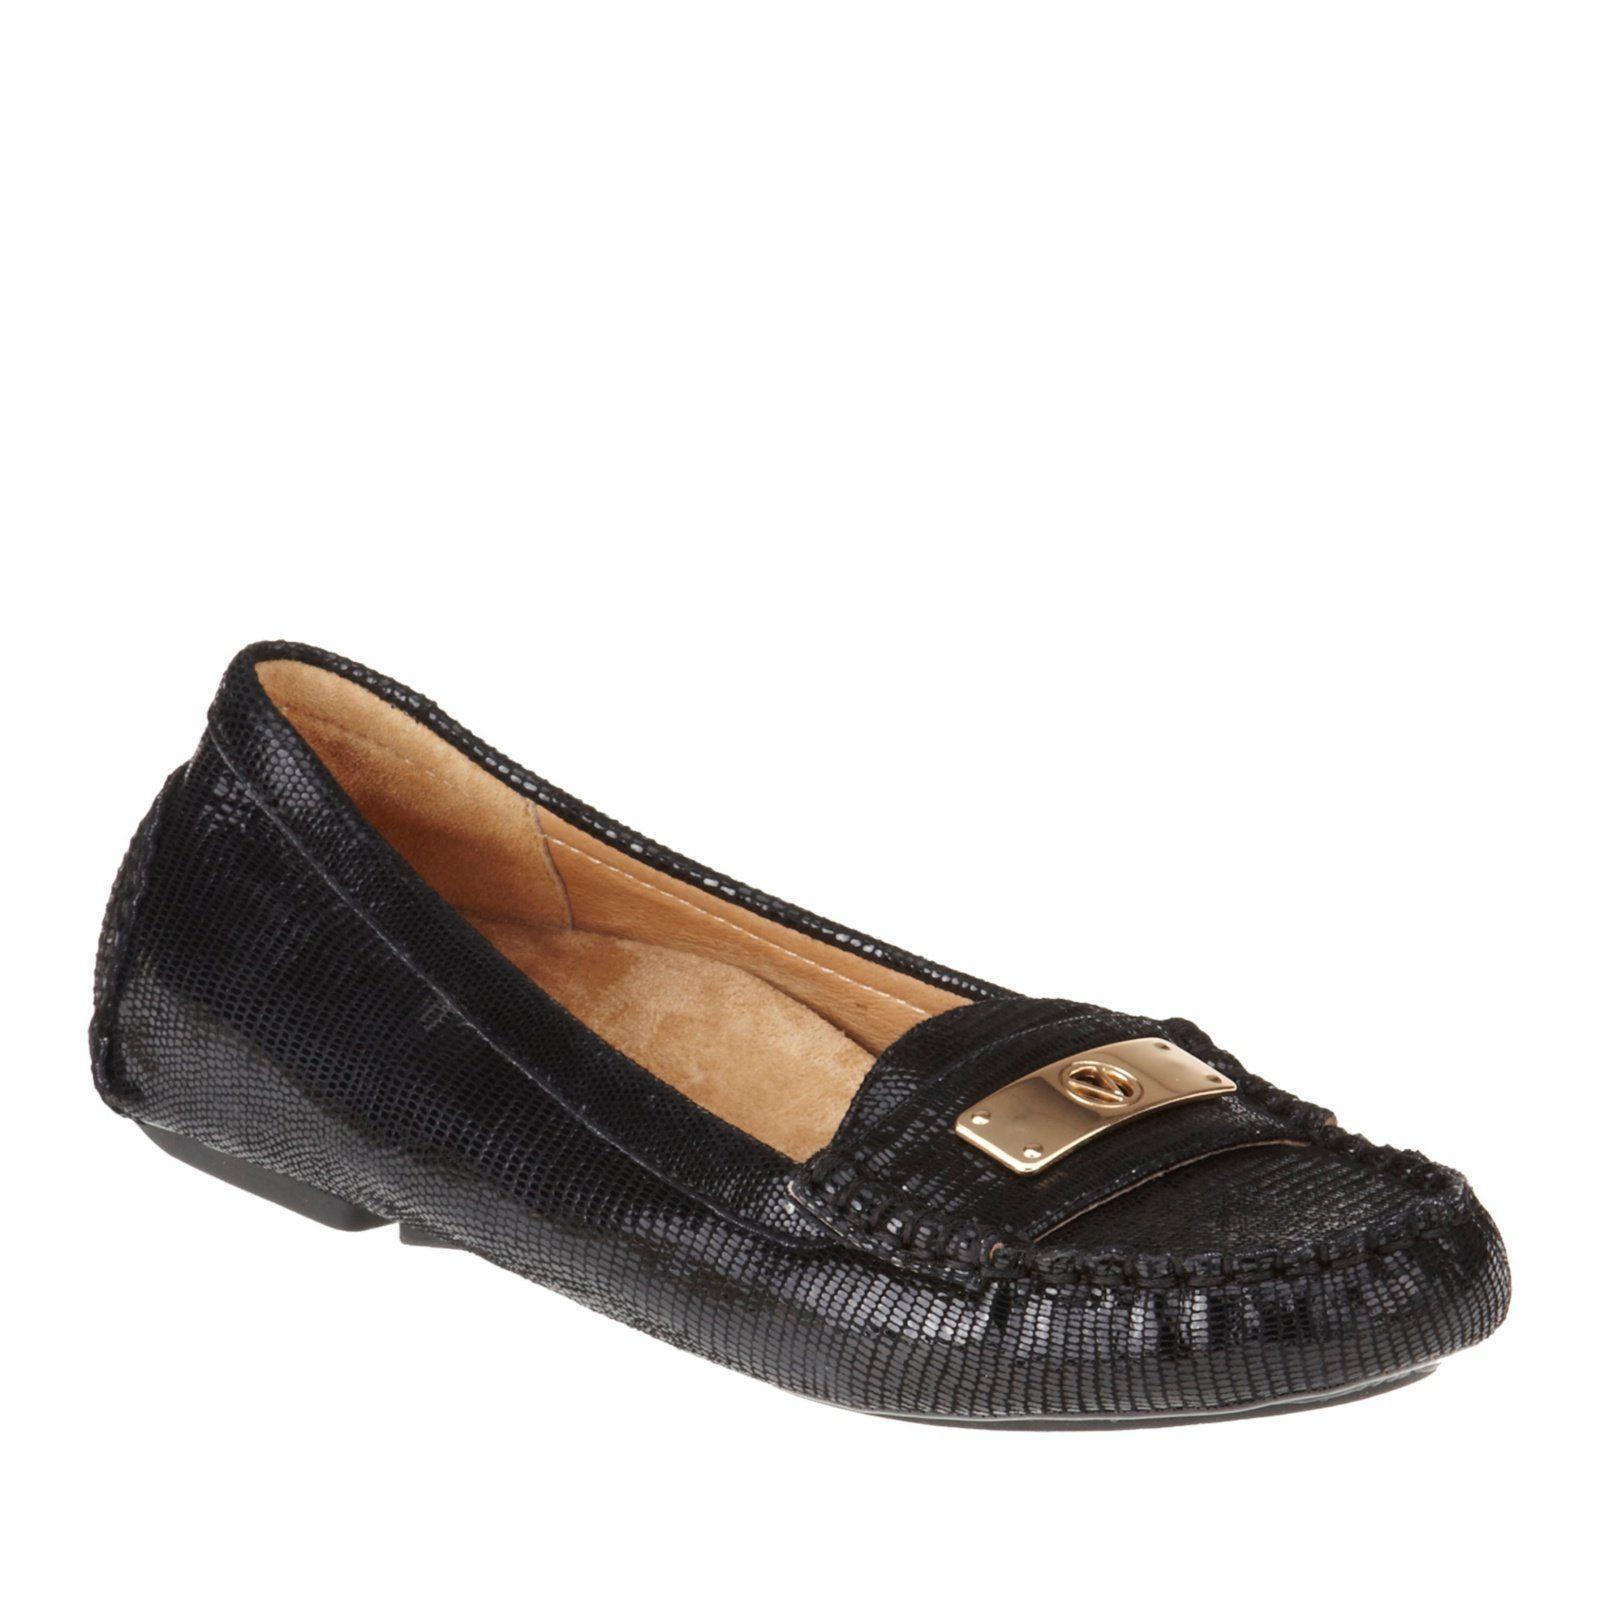 576f61f5992 Vionic Sydney Womens Leather Loafers Black Lizard - 5